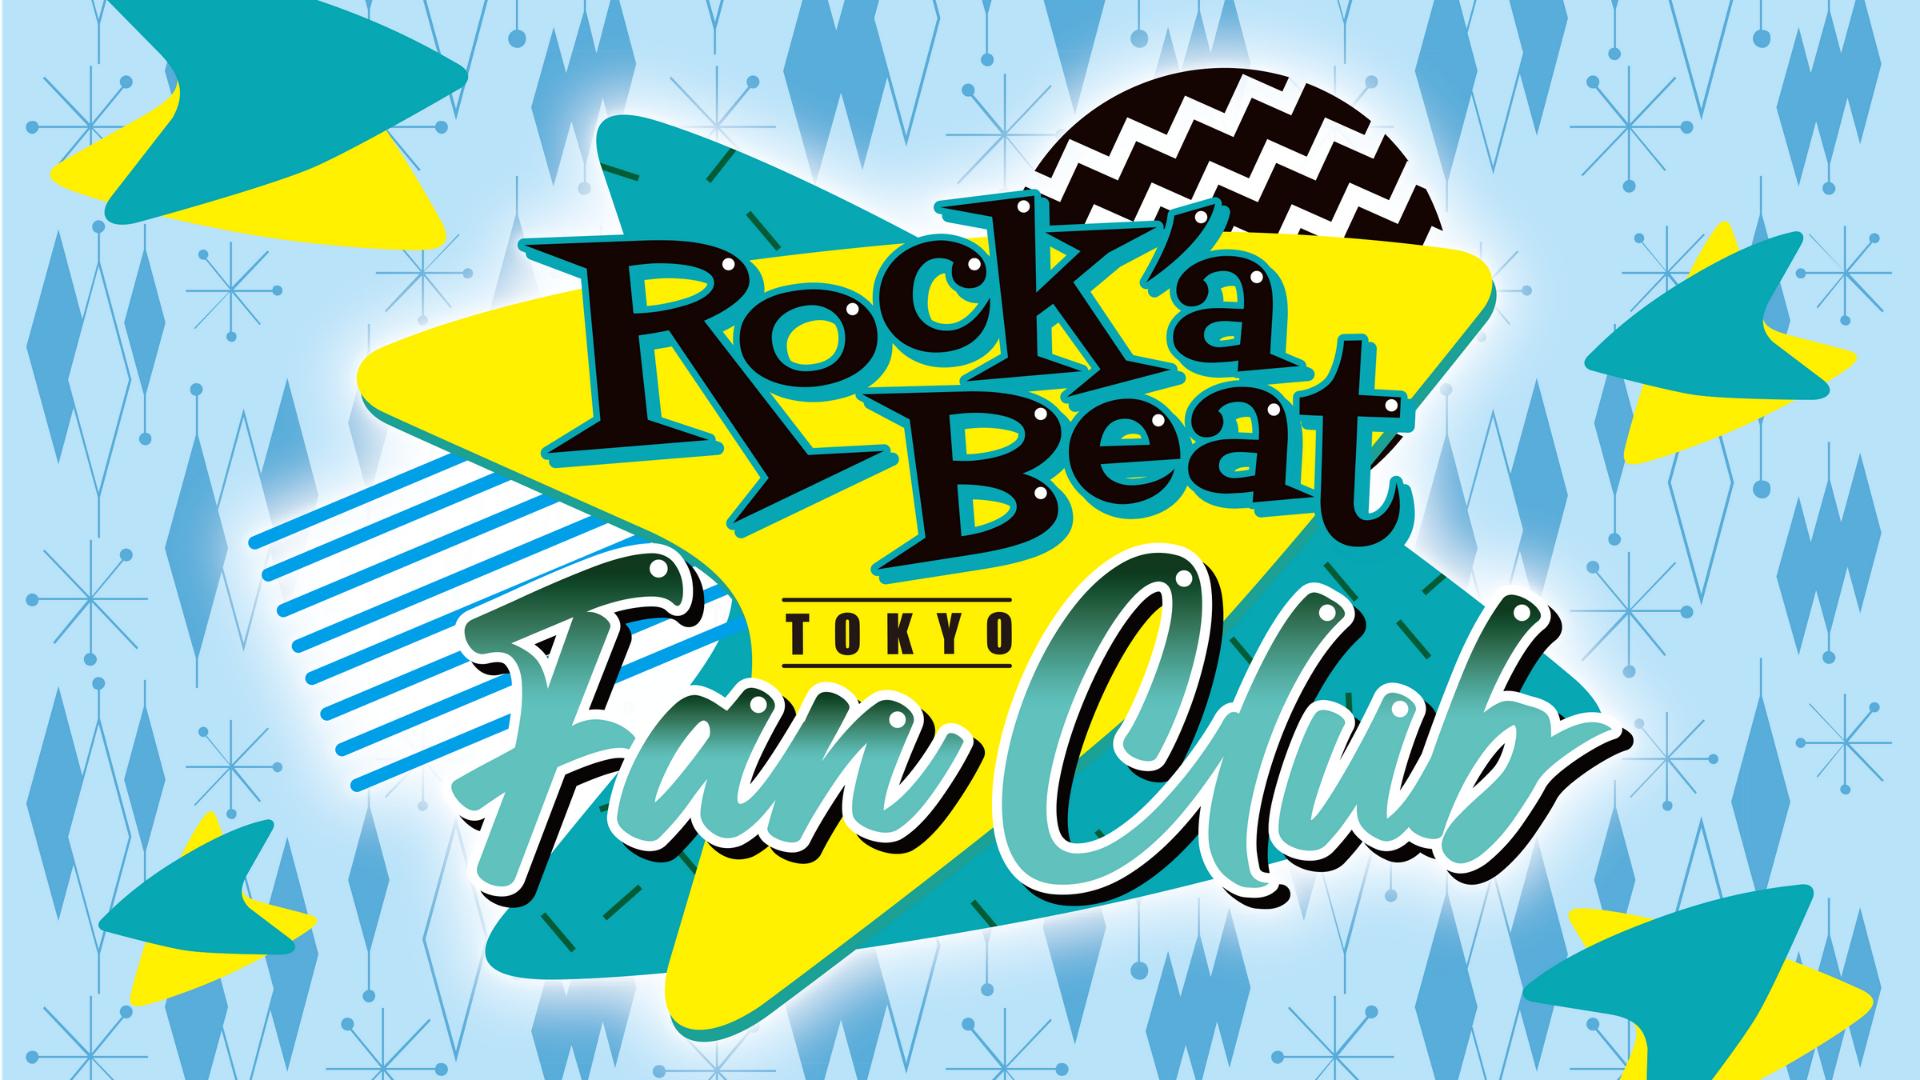 ROCK'A BEAT TOKYO ファンクラブ